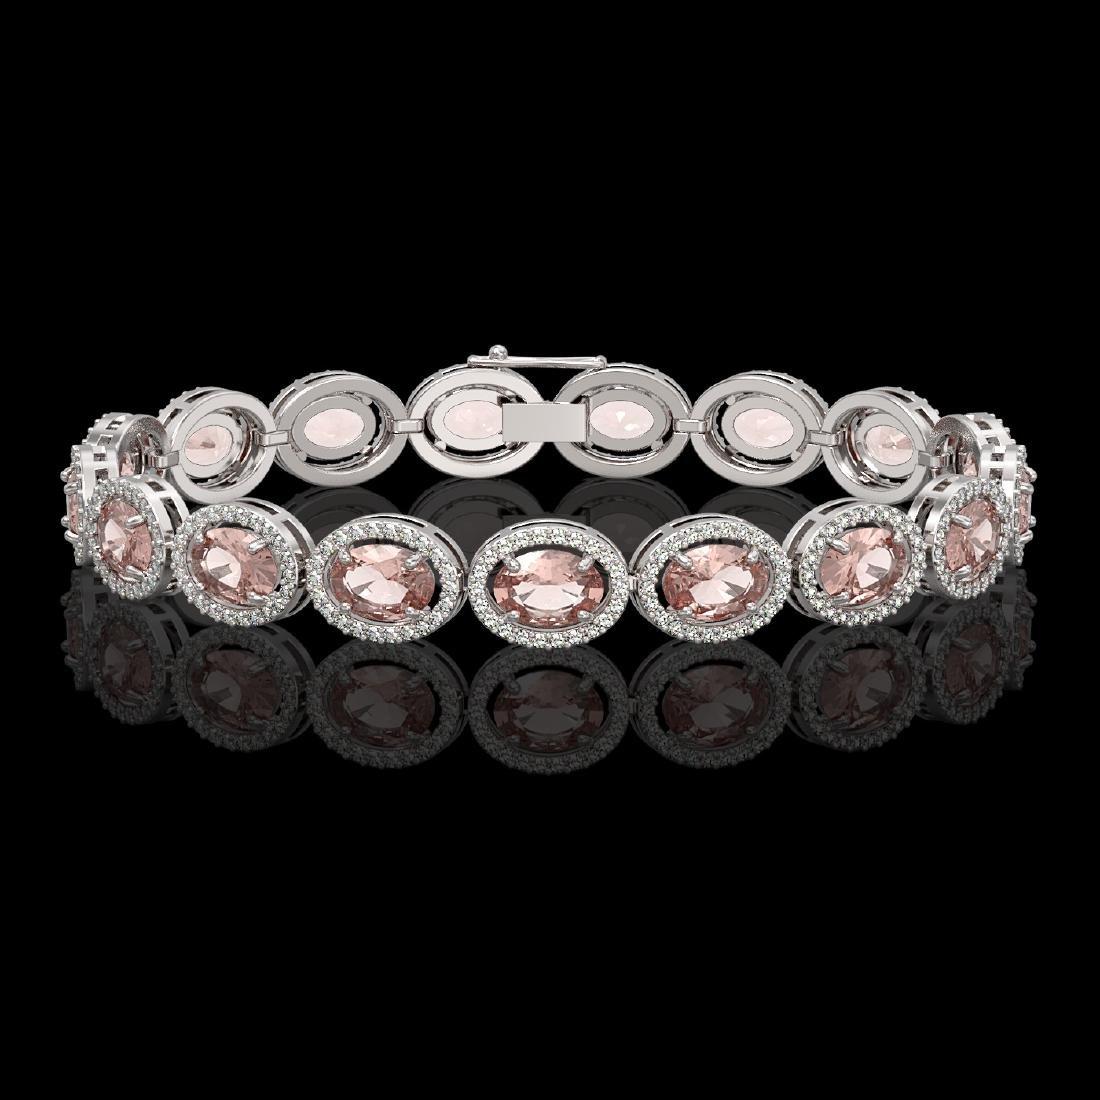 20.18 CTW Morganite & Diamond Halo Bracelet 10K White